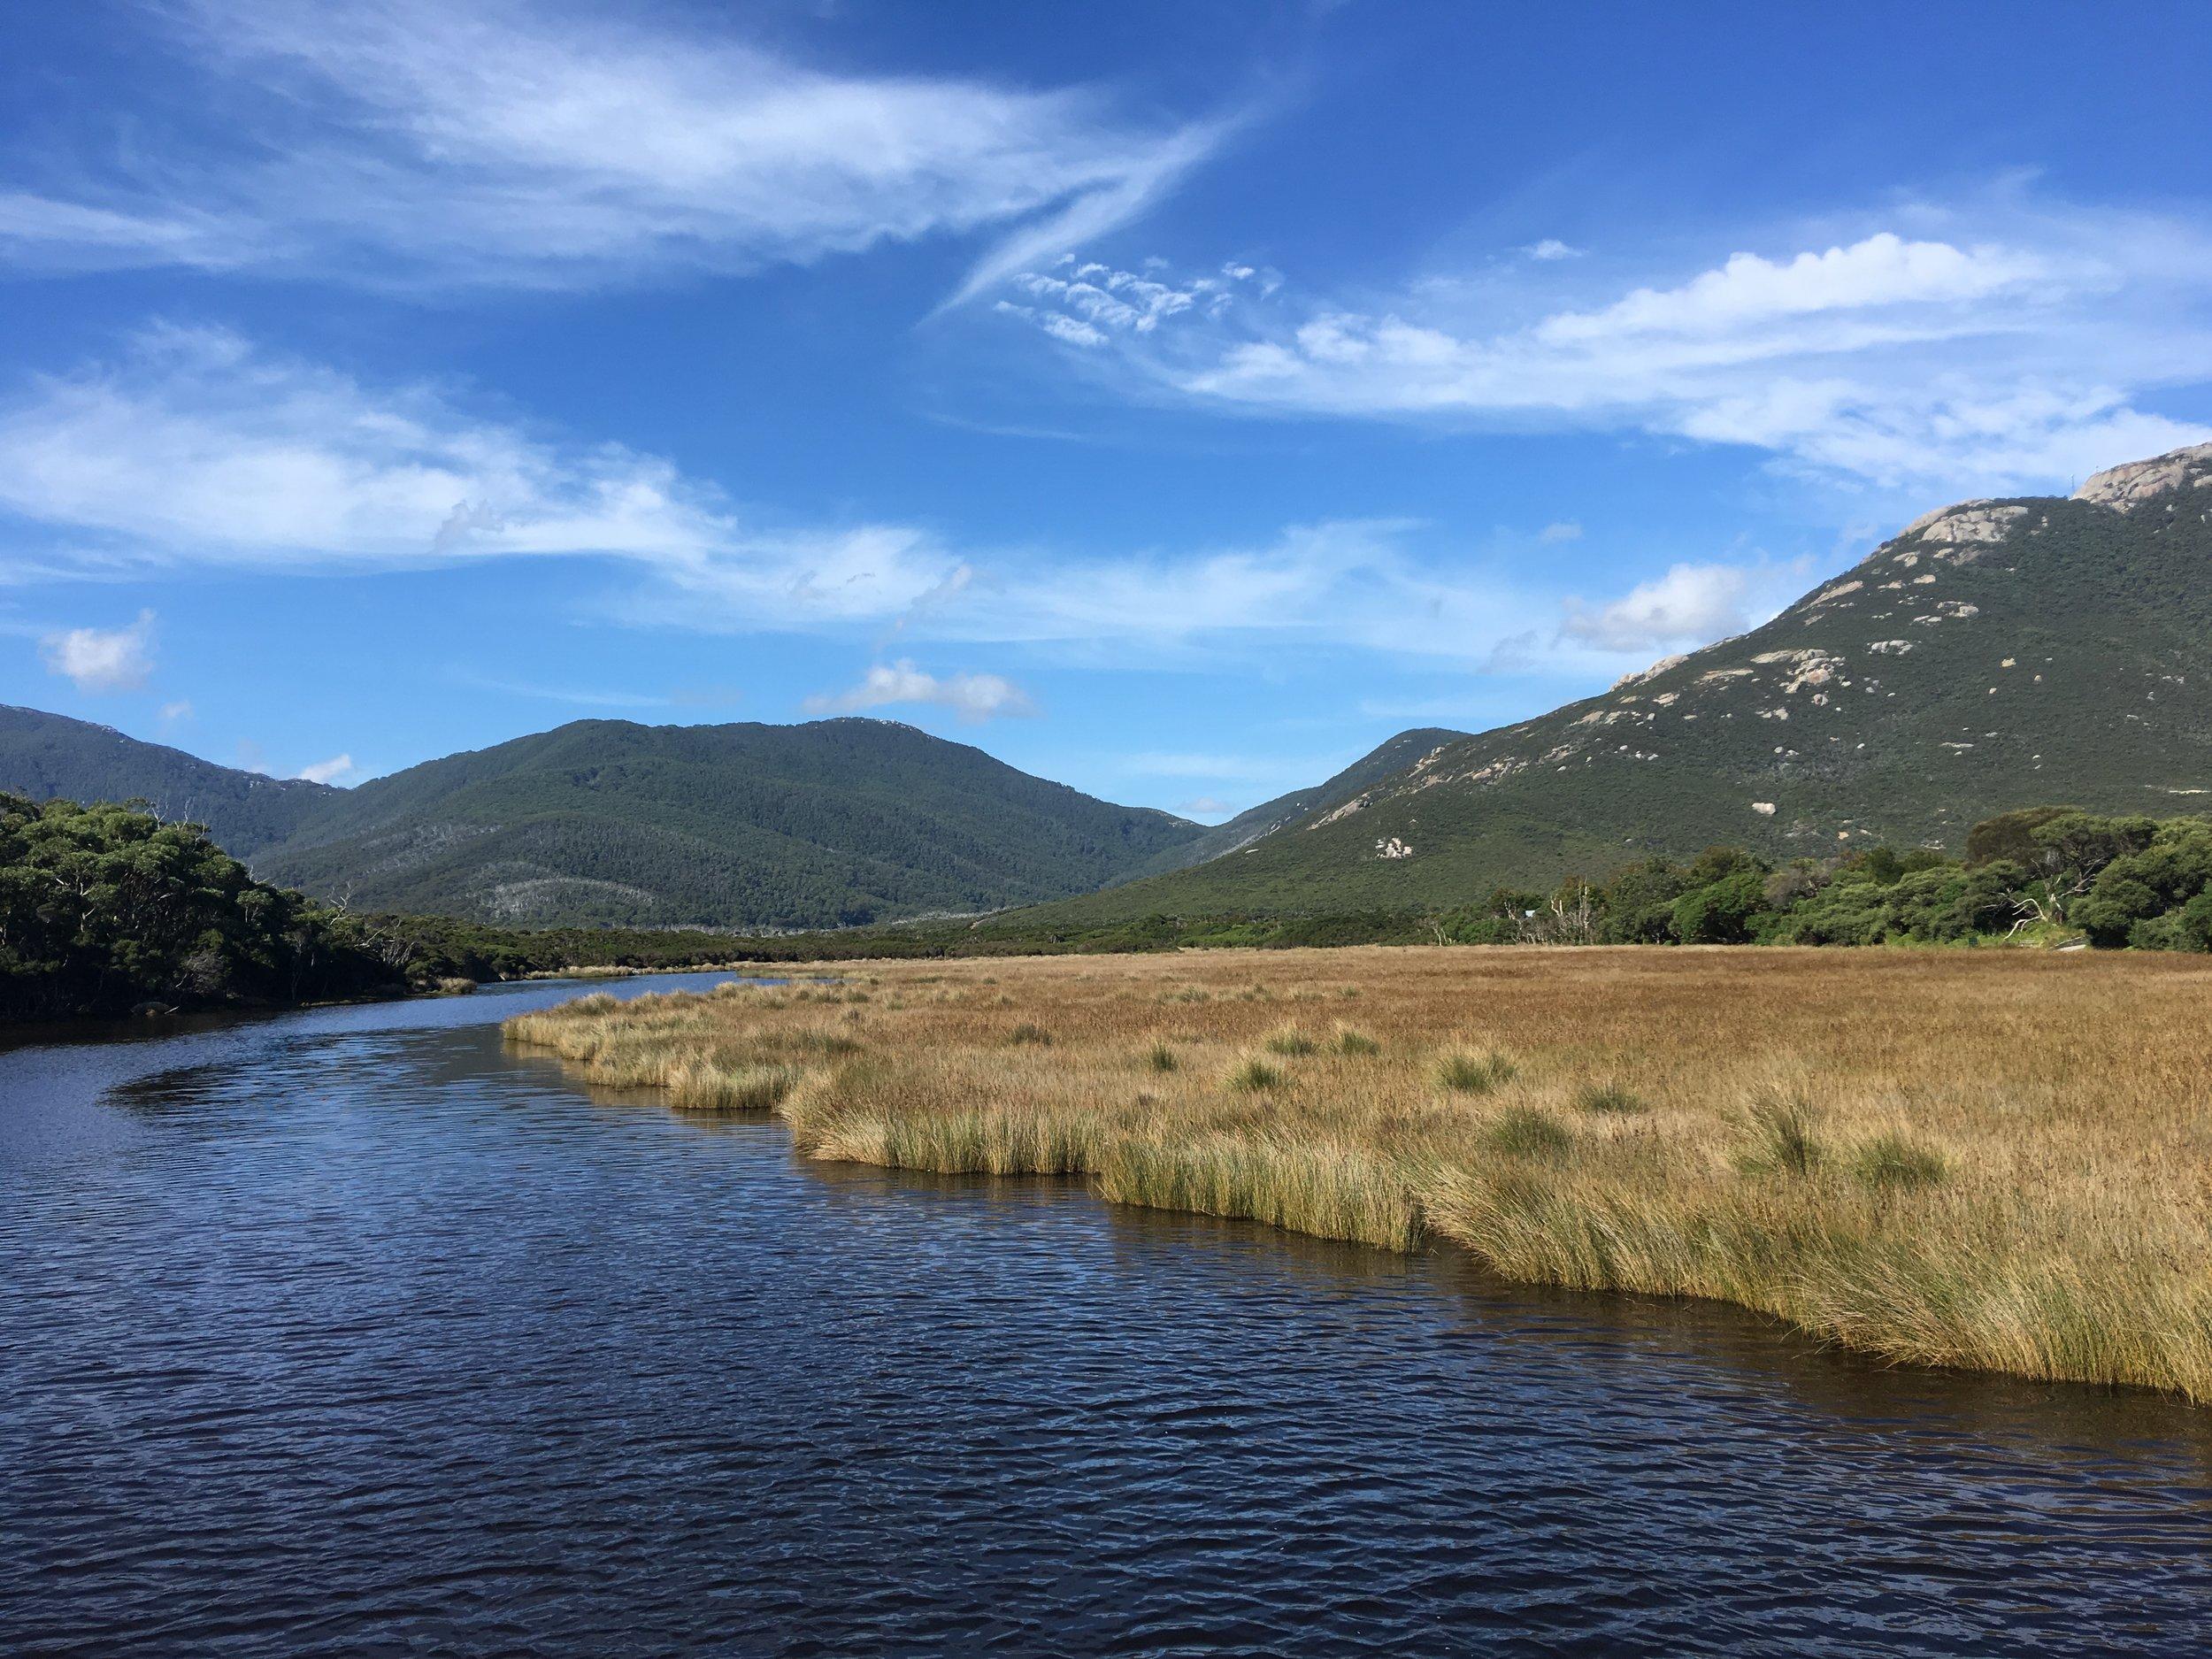 Tidal wetland river